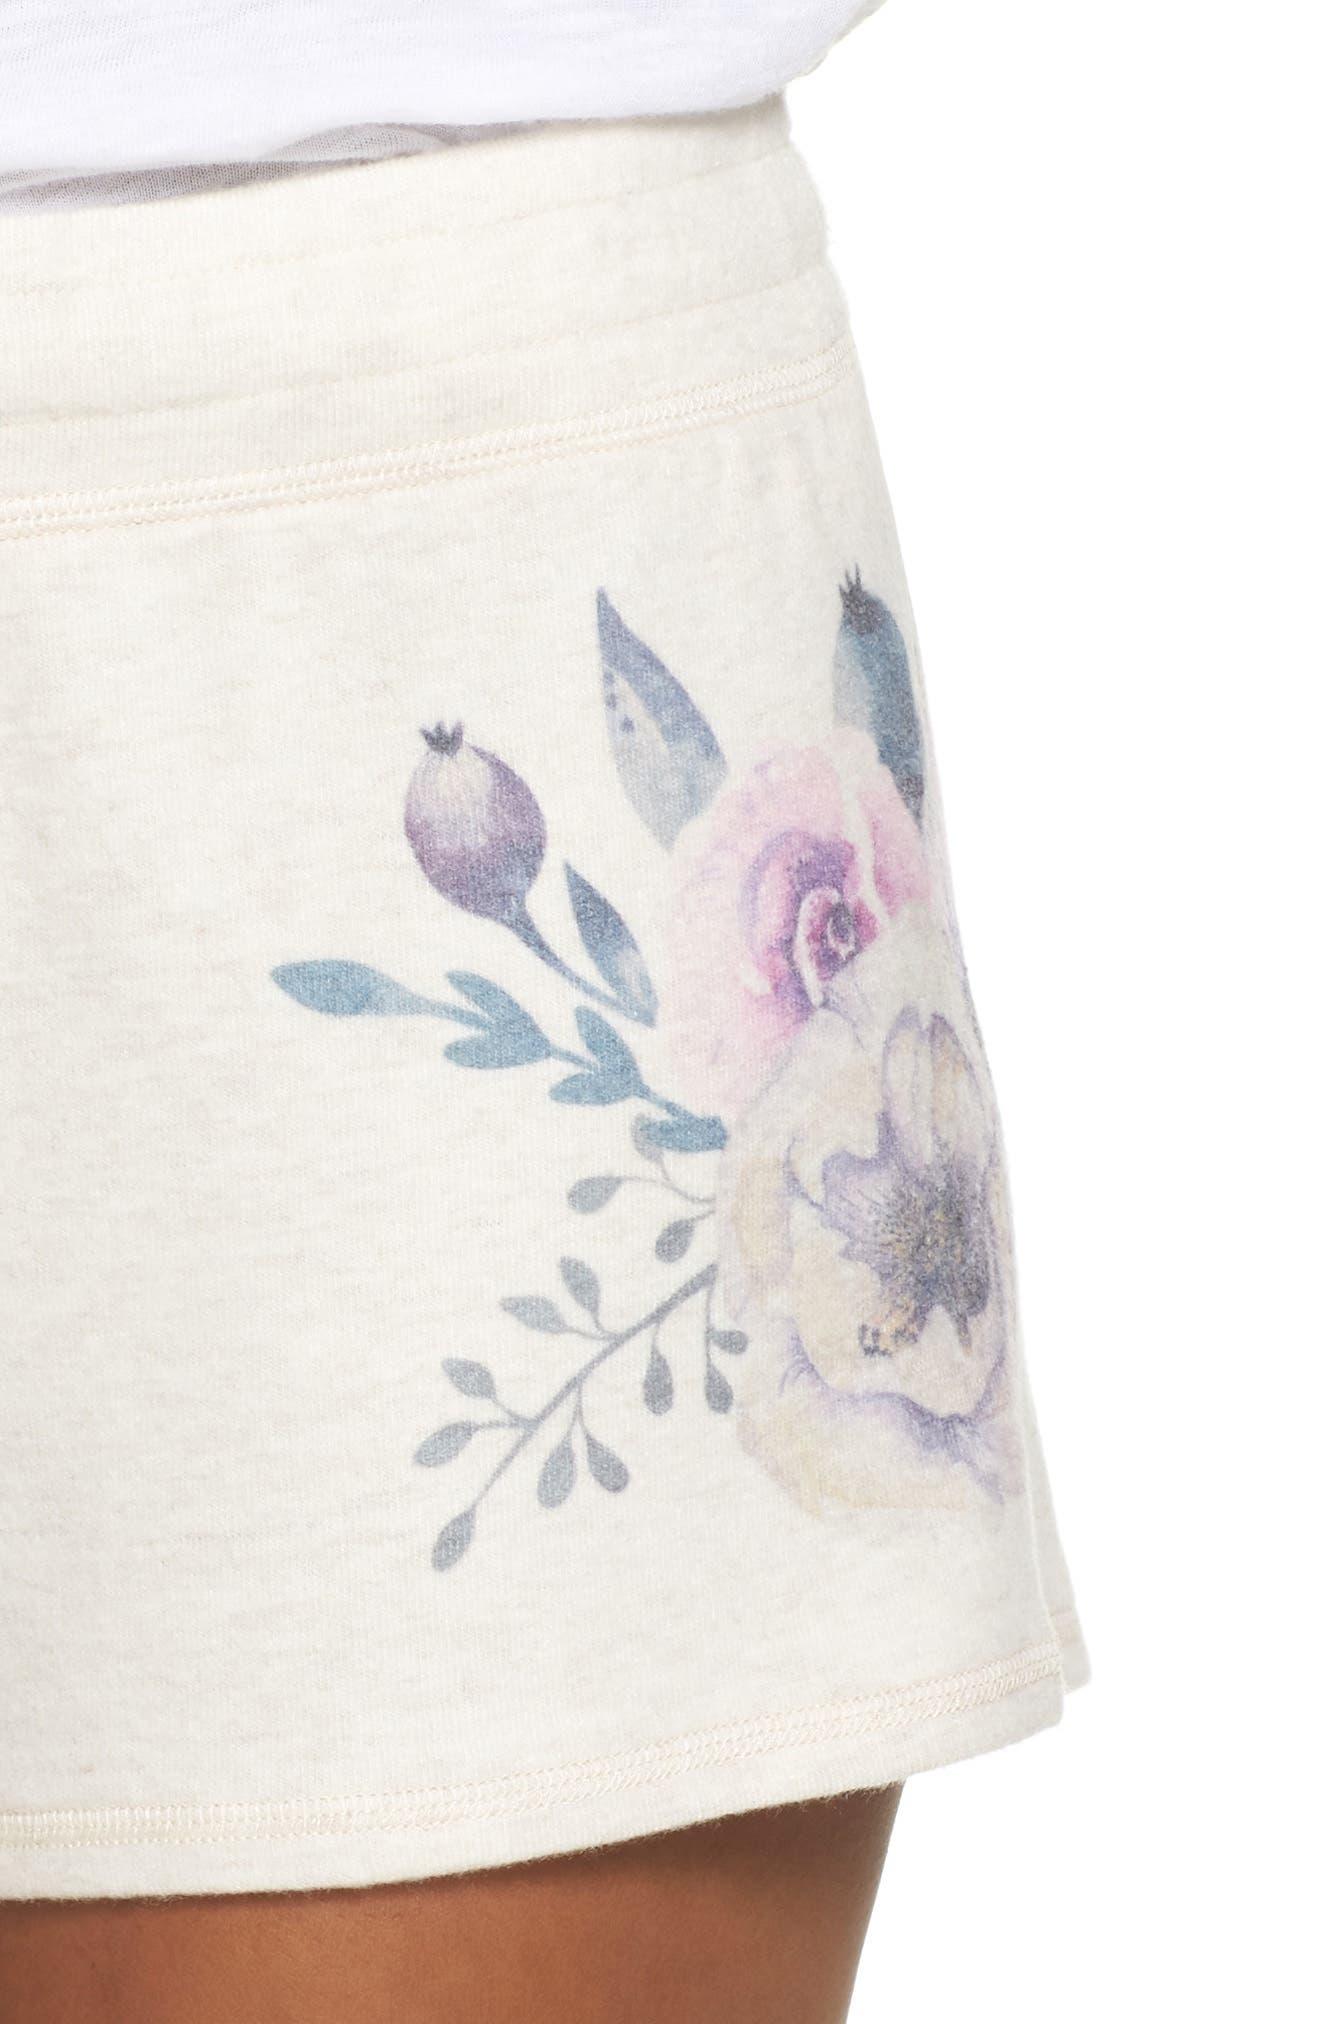 Peachy Floral Pajama Shorts,                             Alternate thumbnail 4, color,                             900